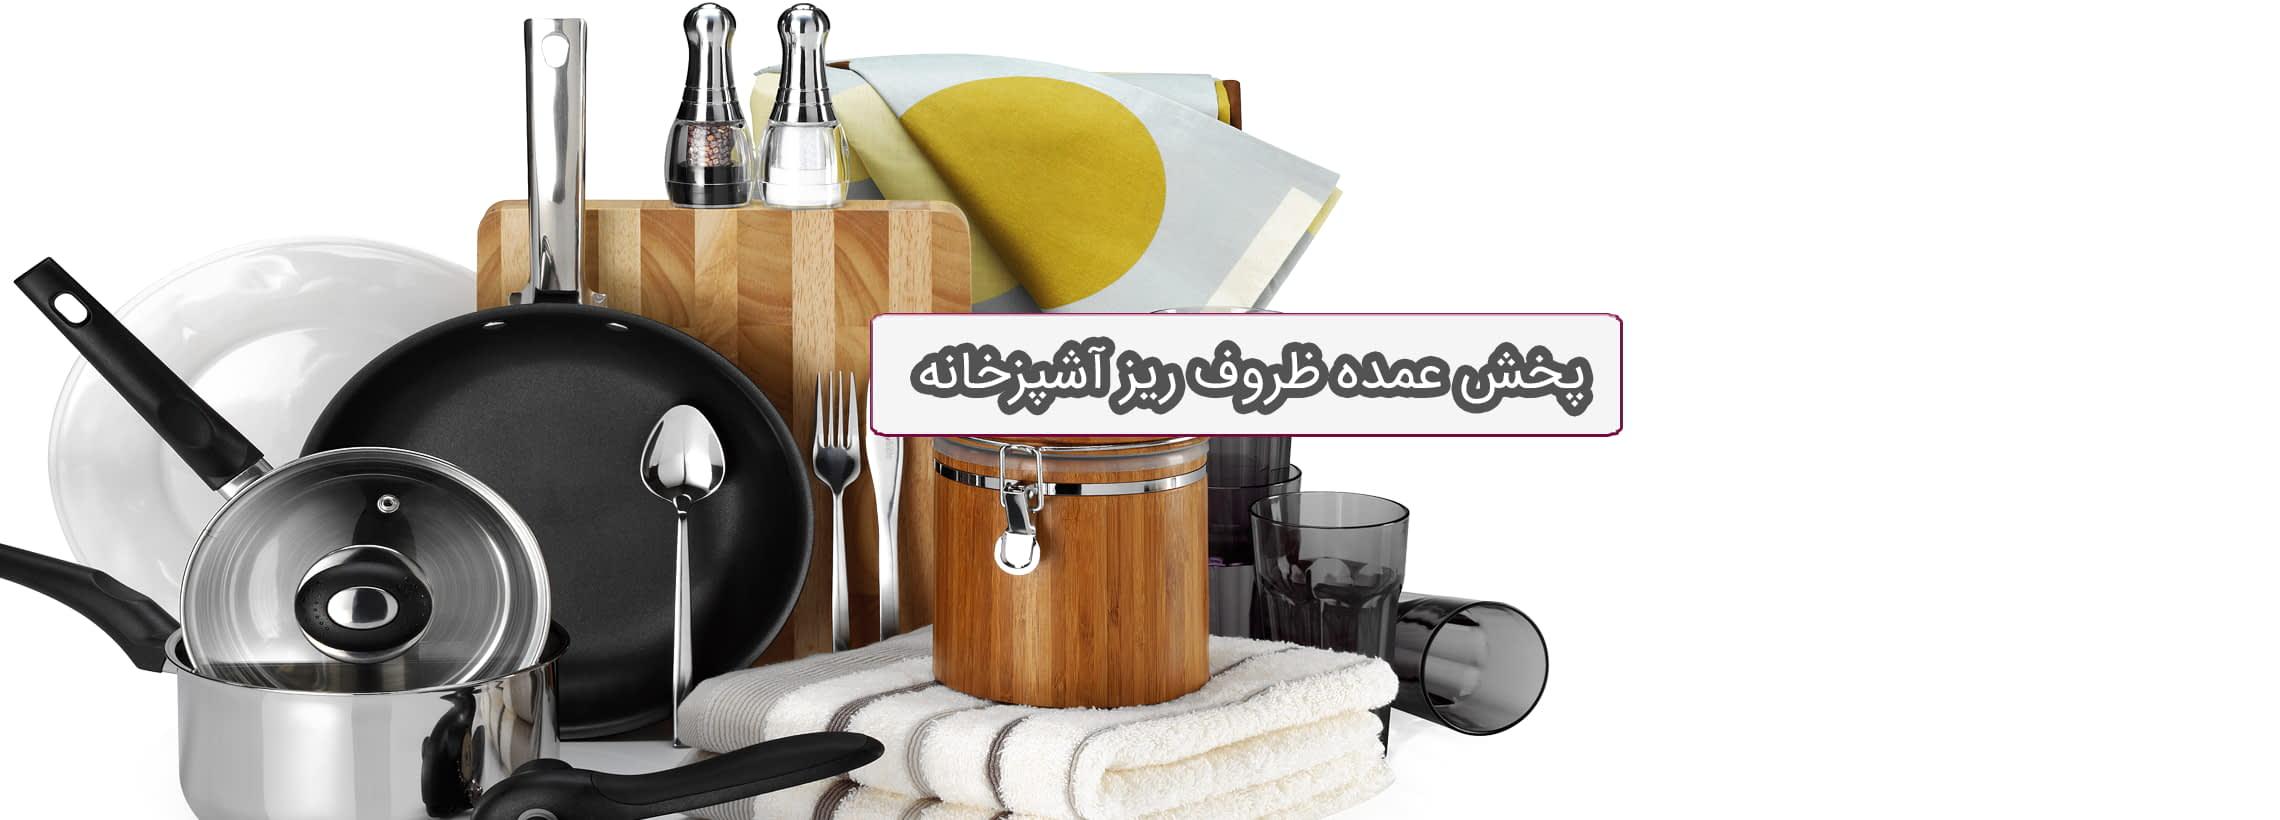 پخش عمده ظروف ریز آشپزخانه صالح آباد